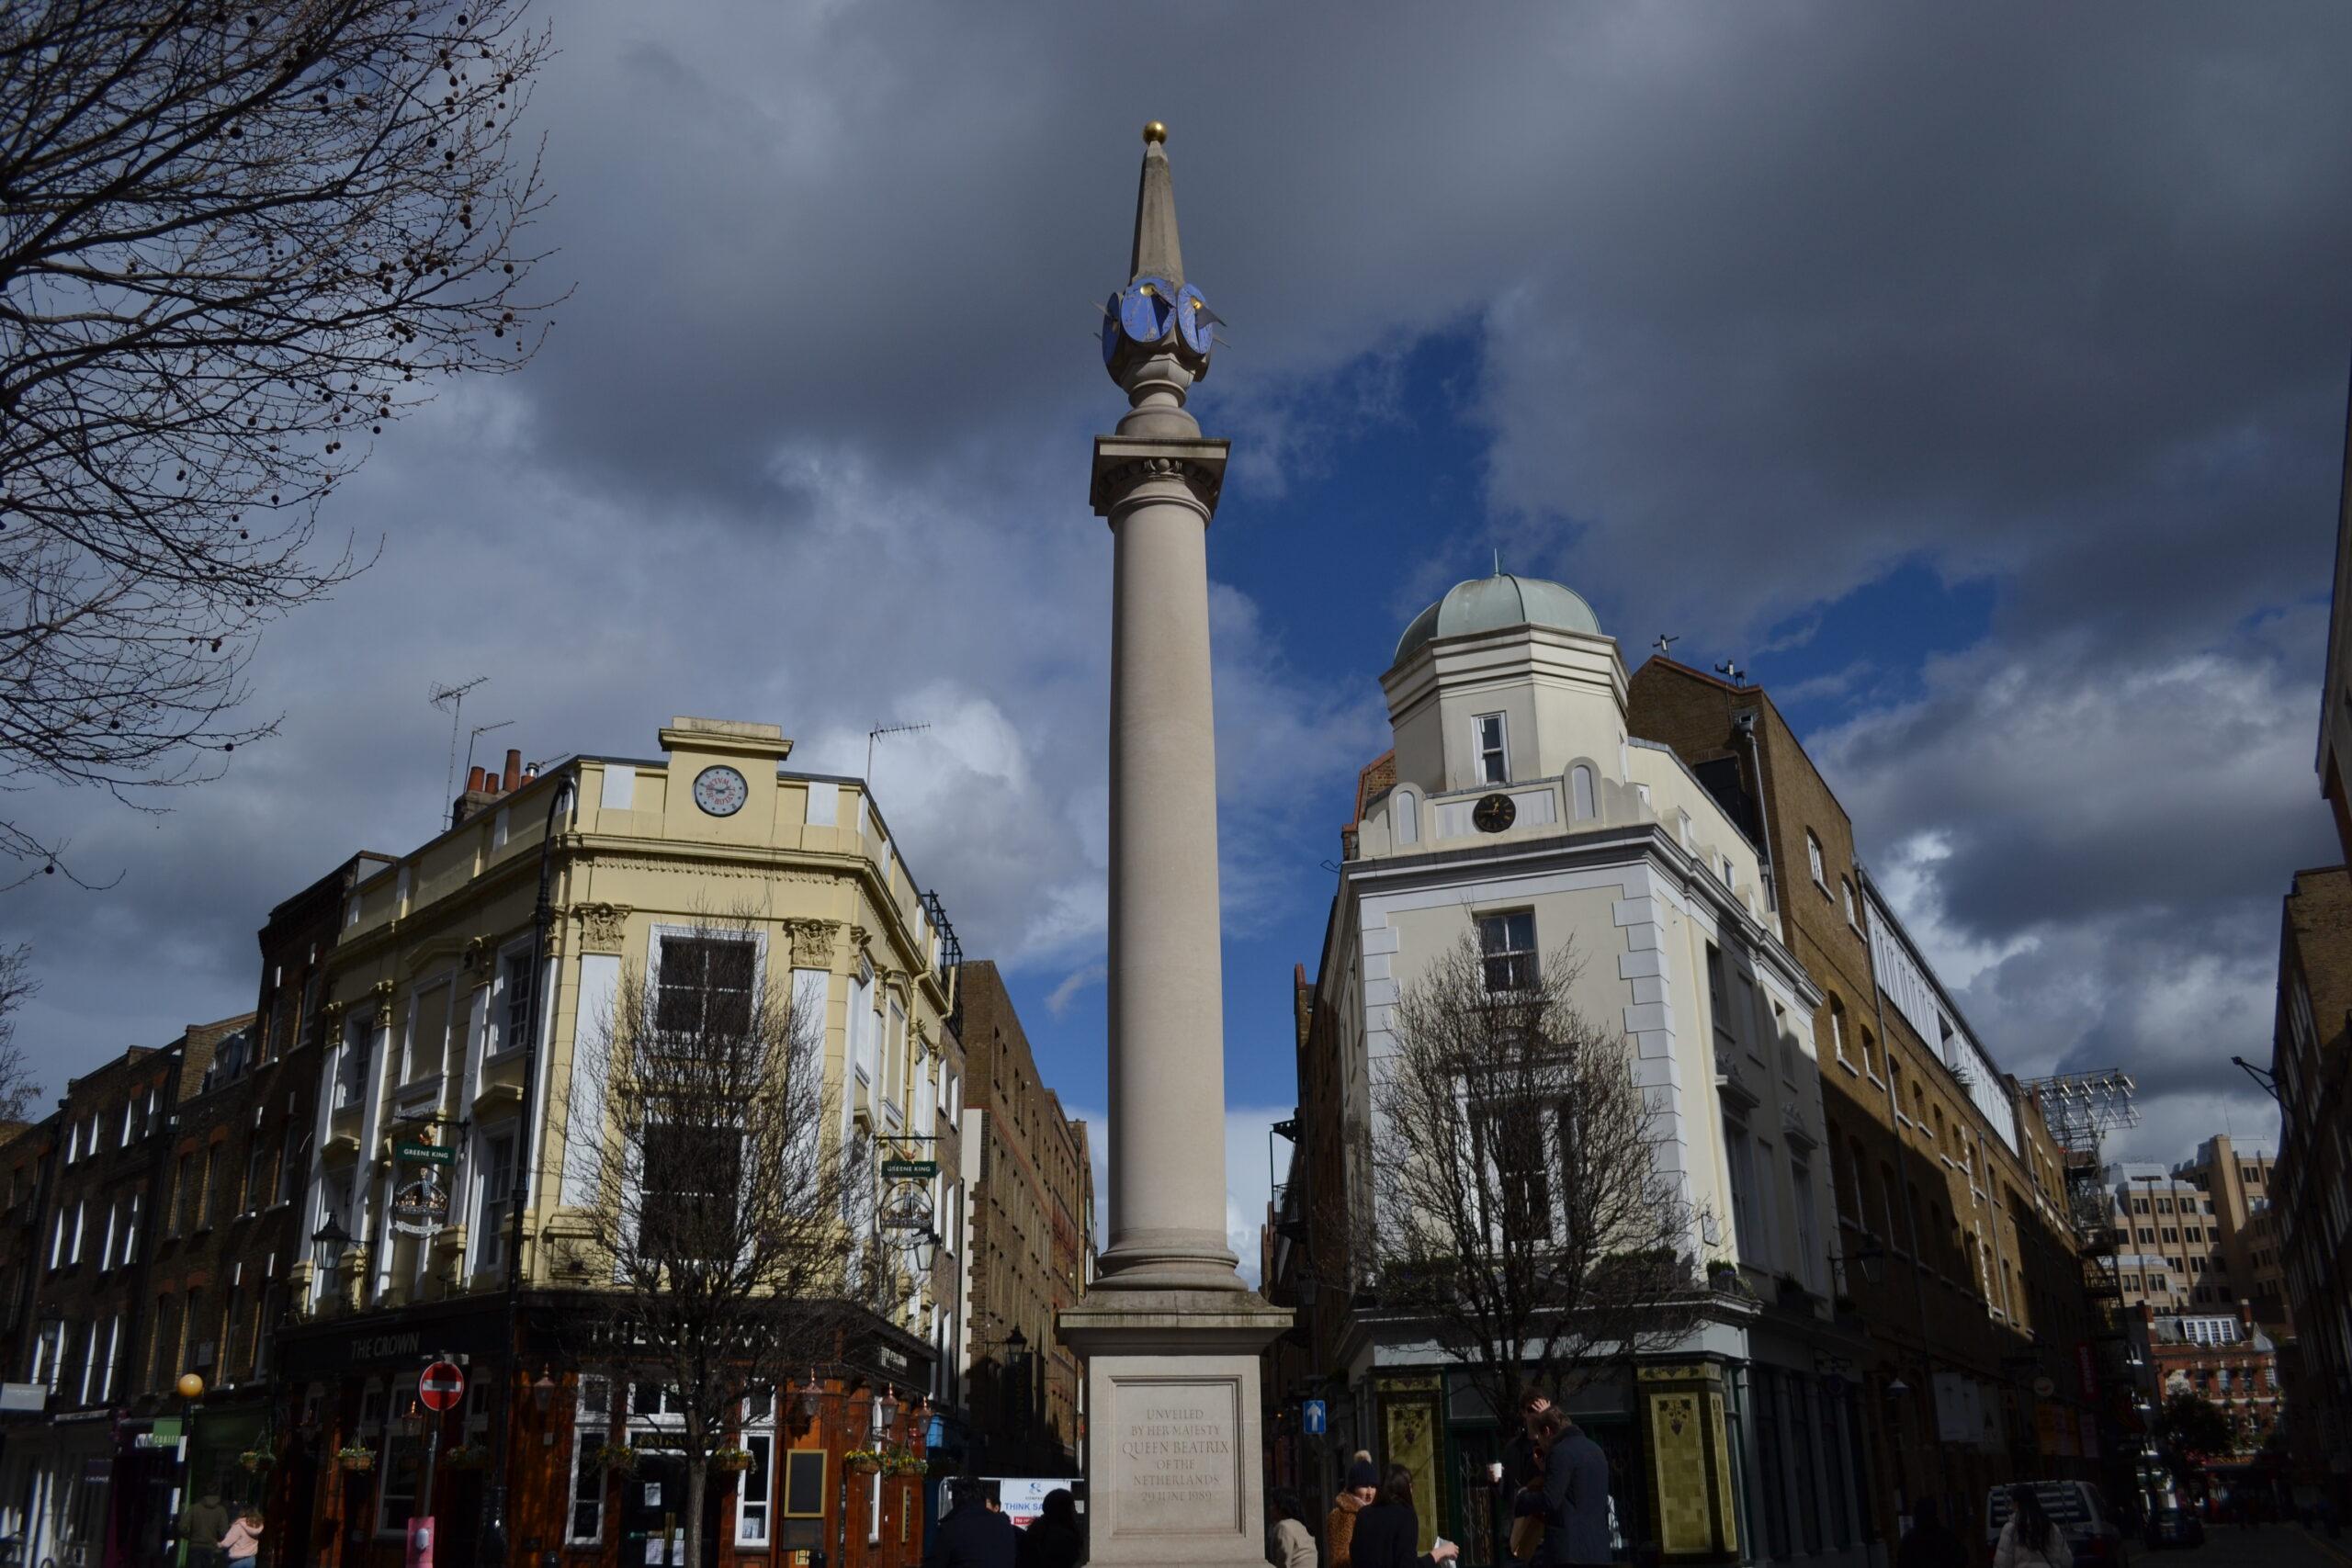 The Seven Dials Pillar